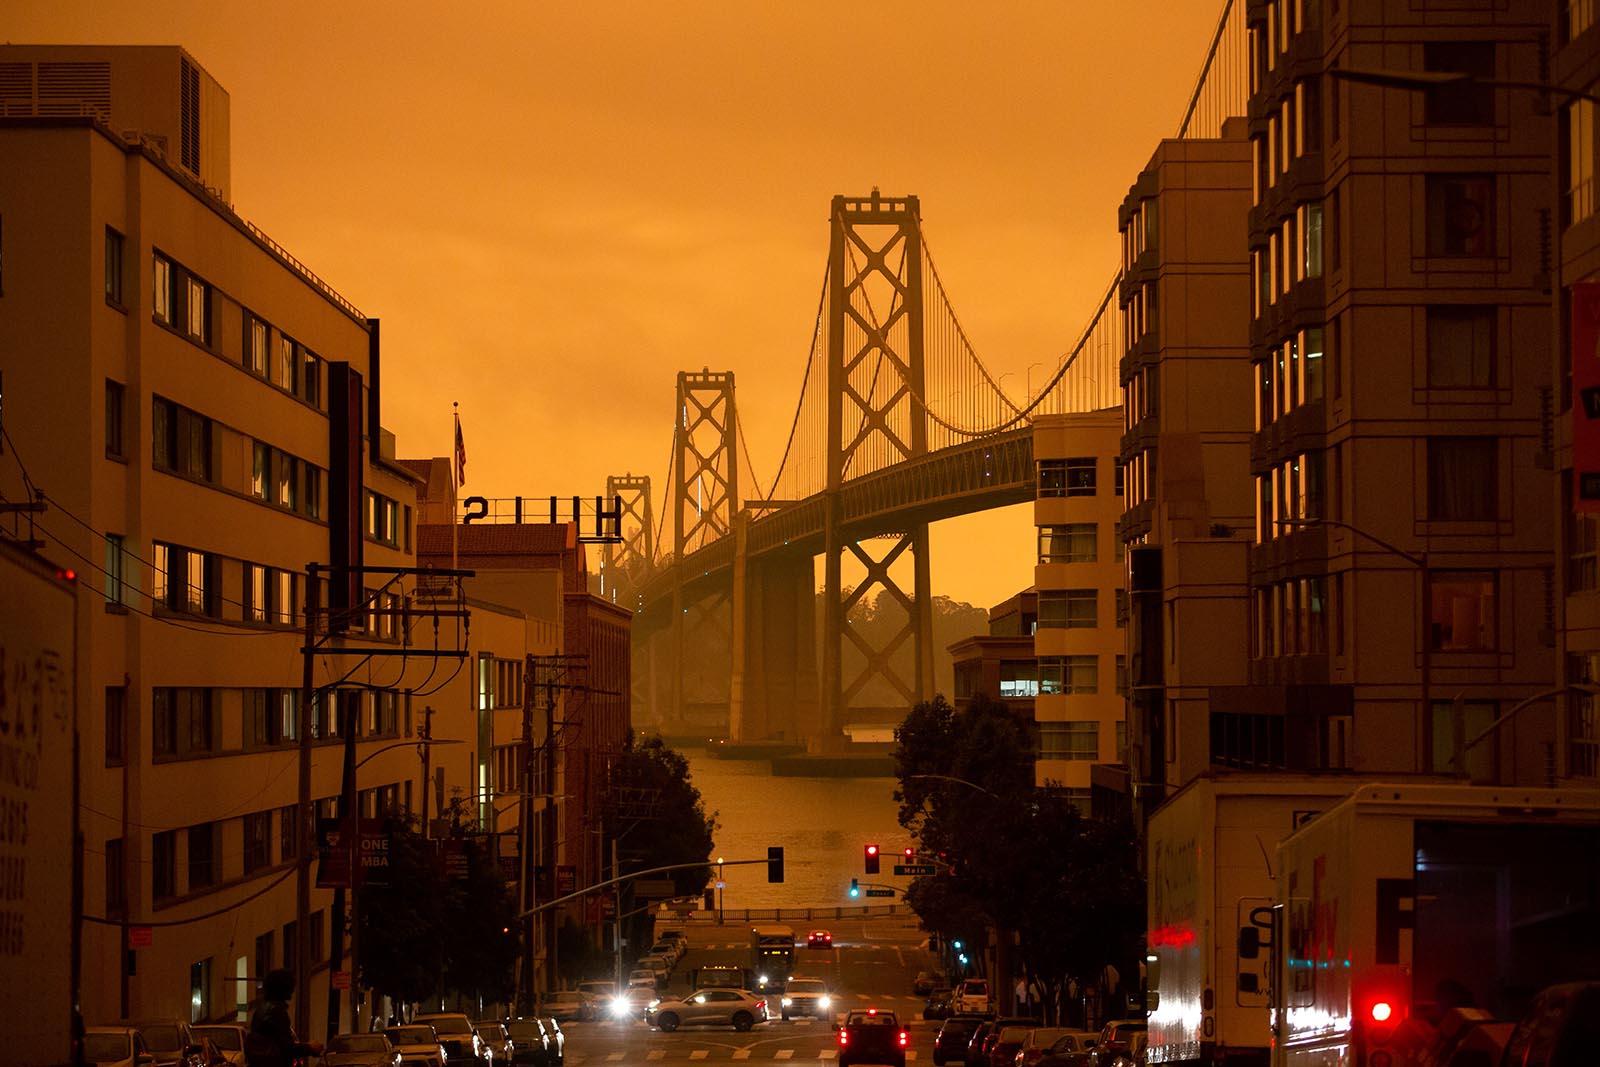 The San Francisco Bay Bridge is seen along Harrison Street under an orange smoke-filled sky in San Francisco on September 9.